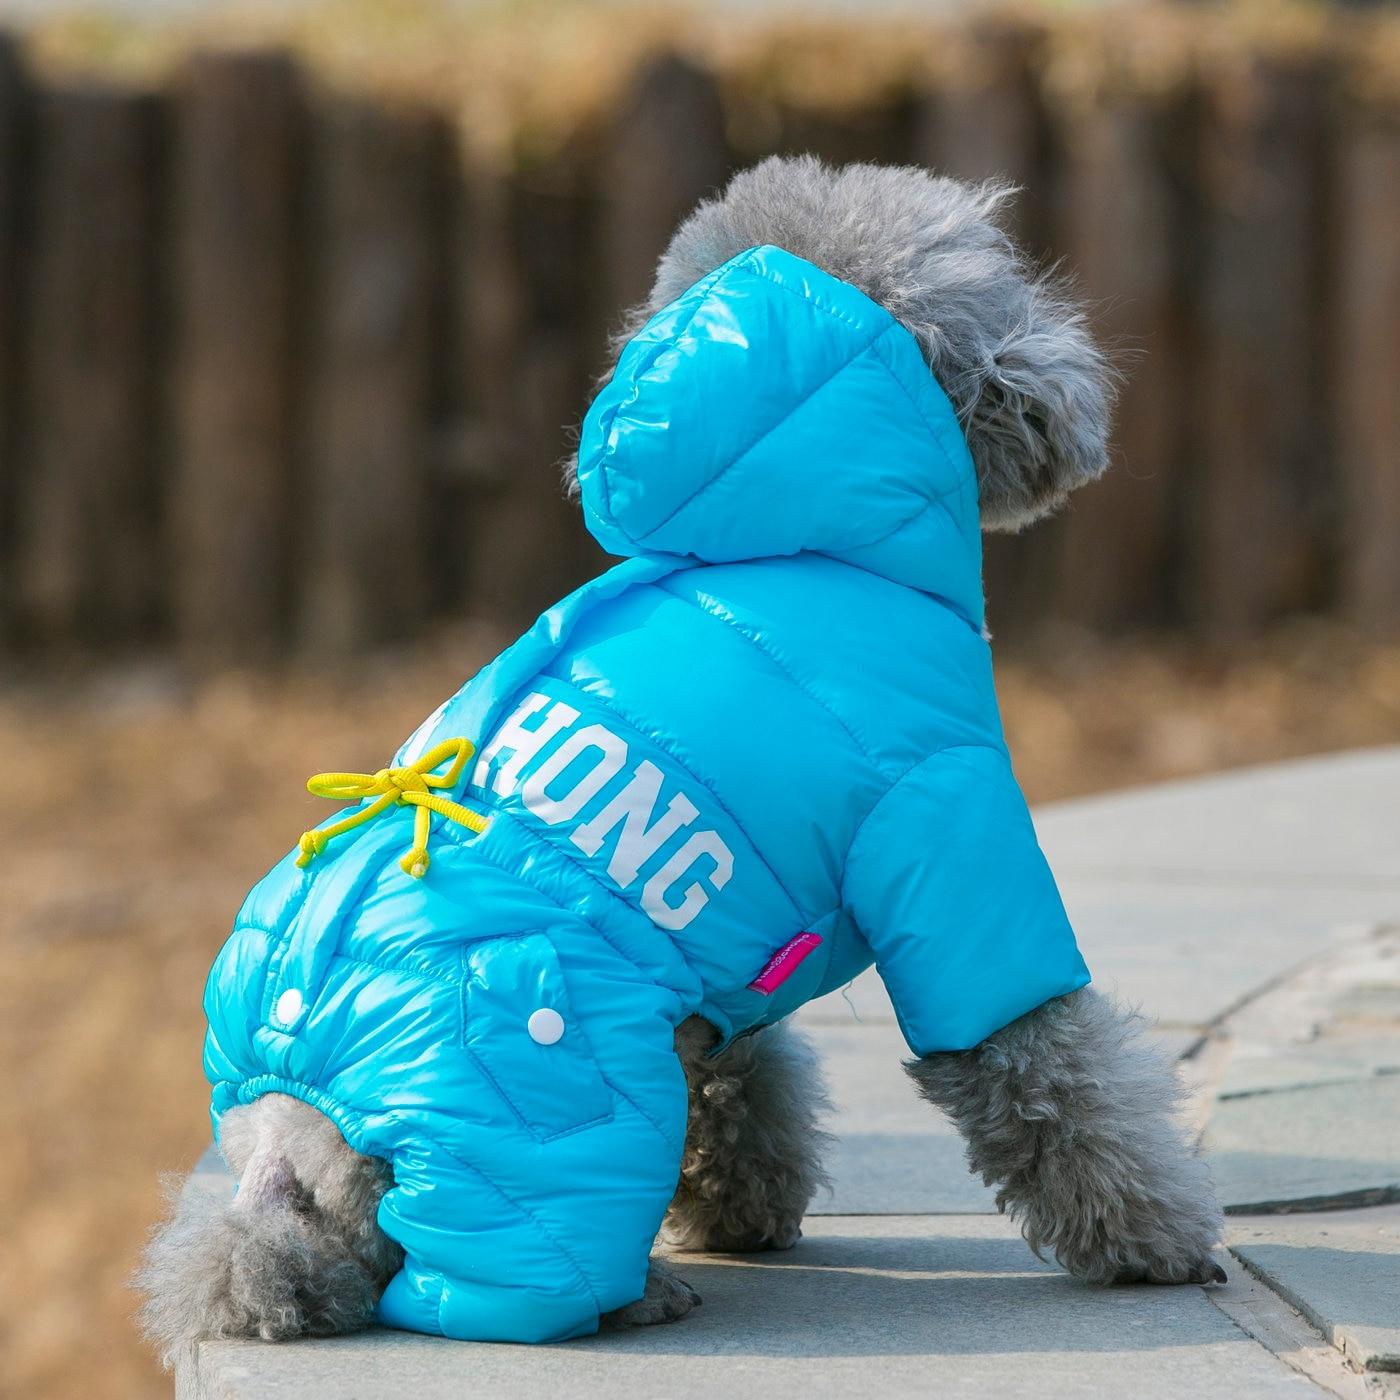 Warm Winter Outfit for Dog Pet Jumpsuit Fur Hoodies Pet Overalls Cat ...